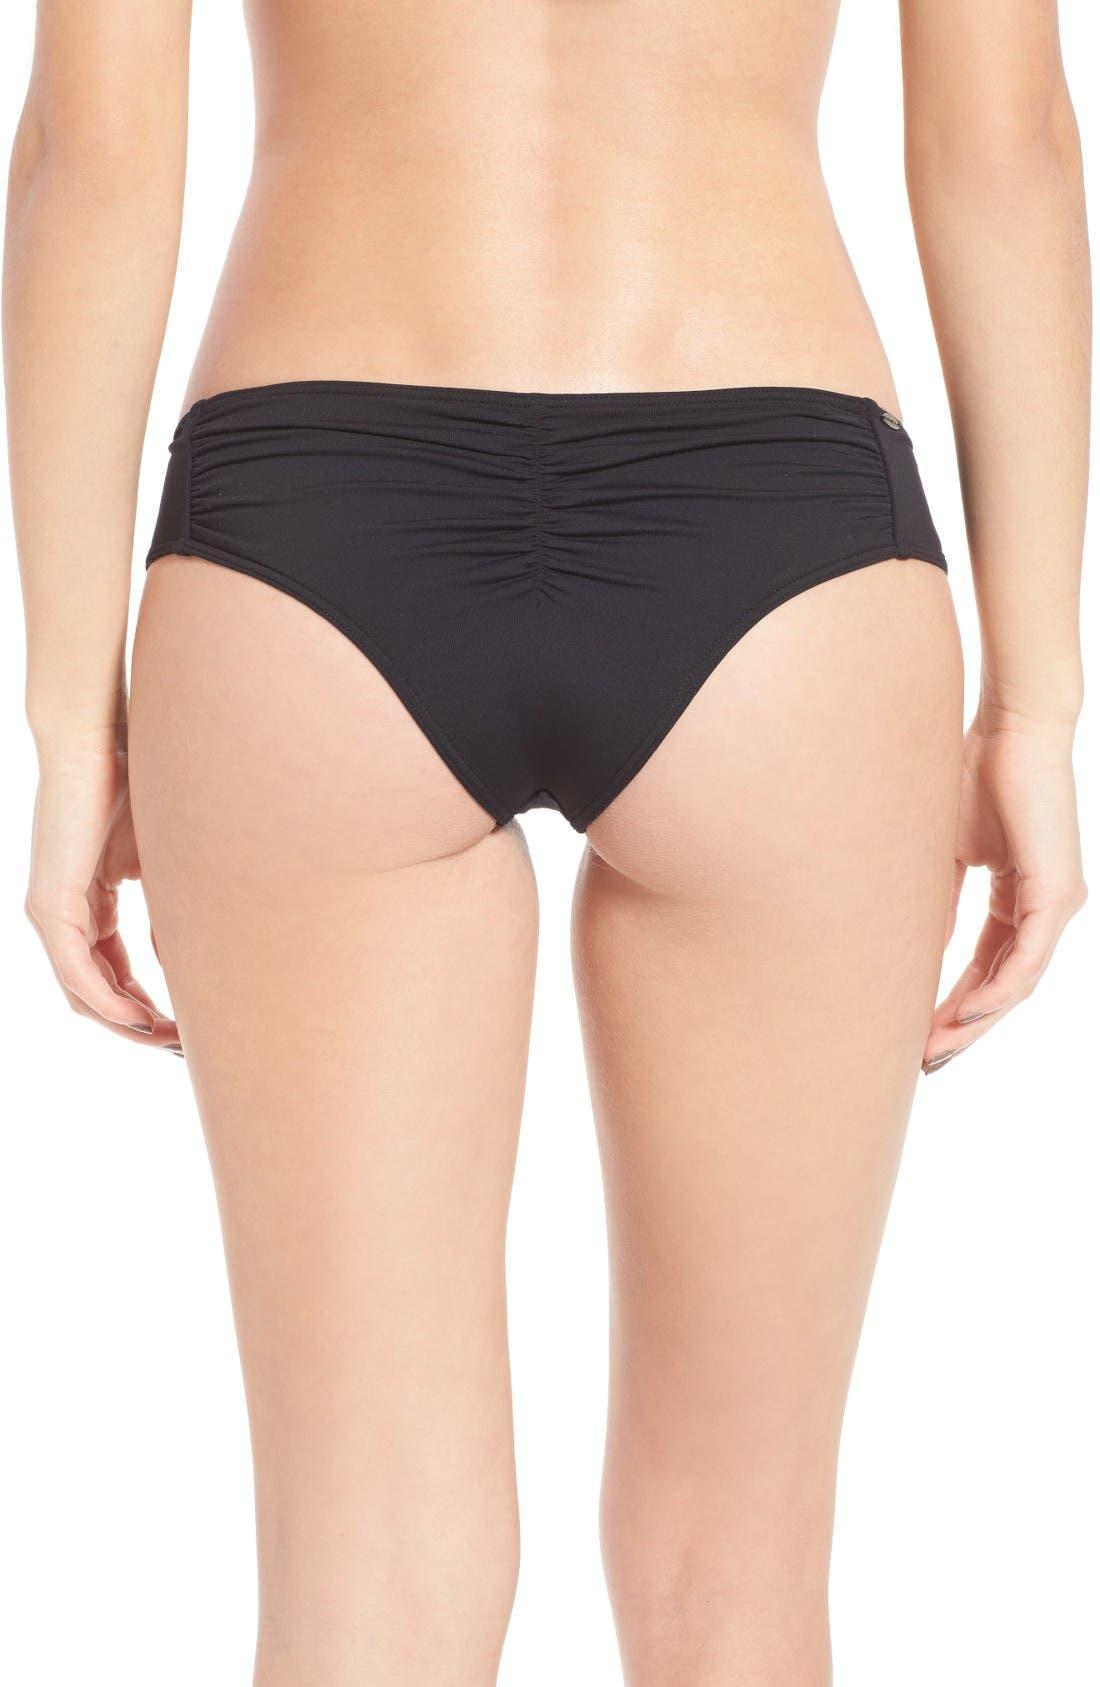 Main Image - O'Neill Salt Water Solids Hipster Bikini Bottoms